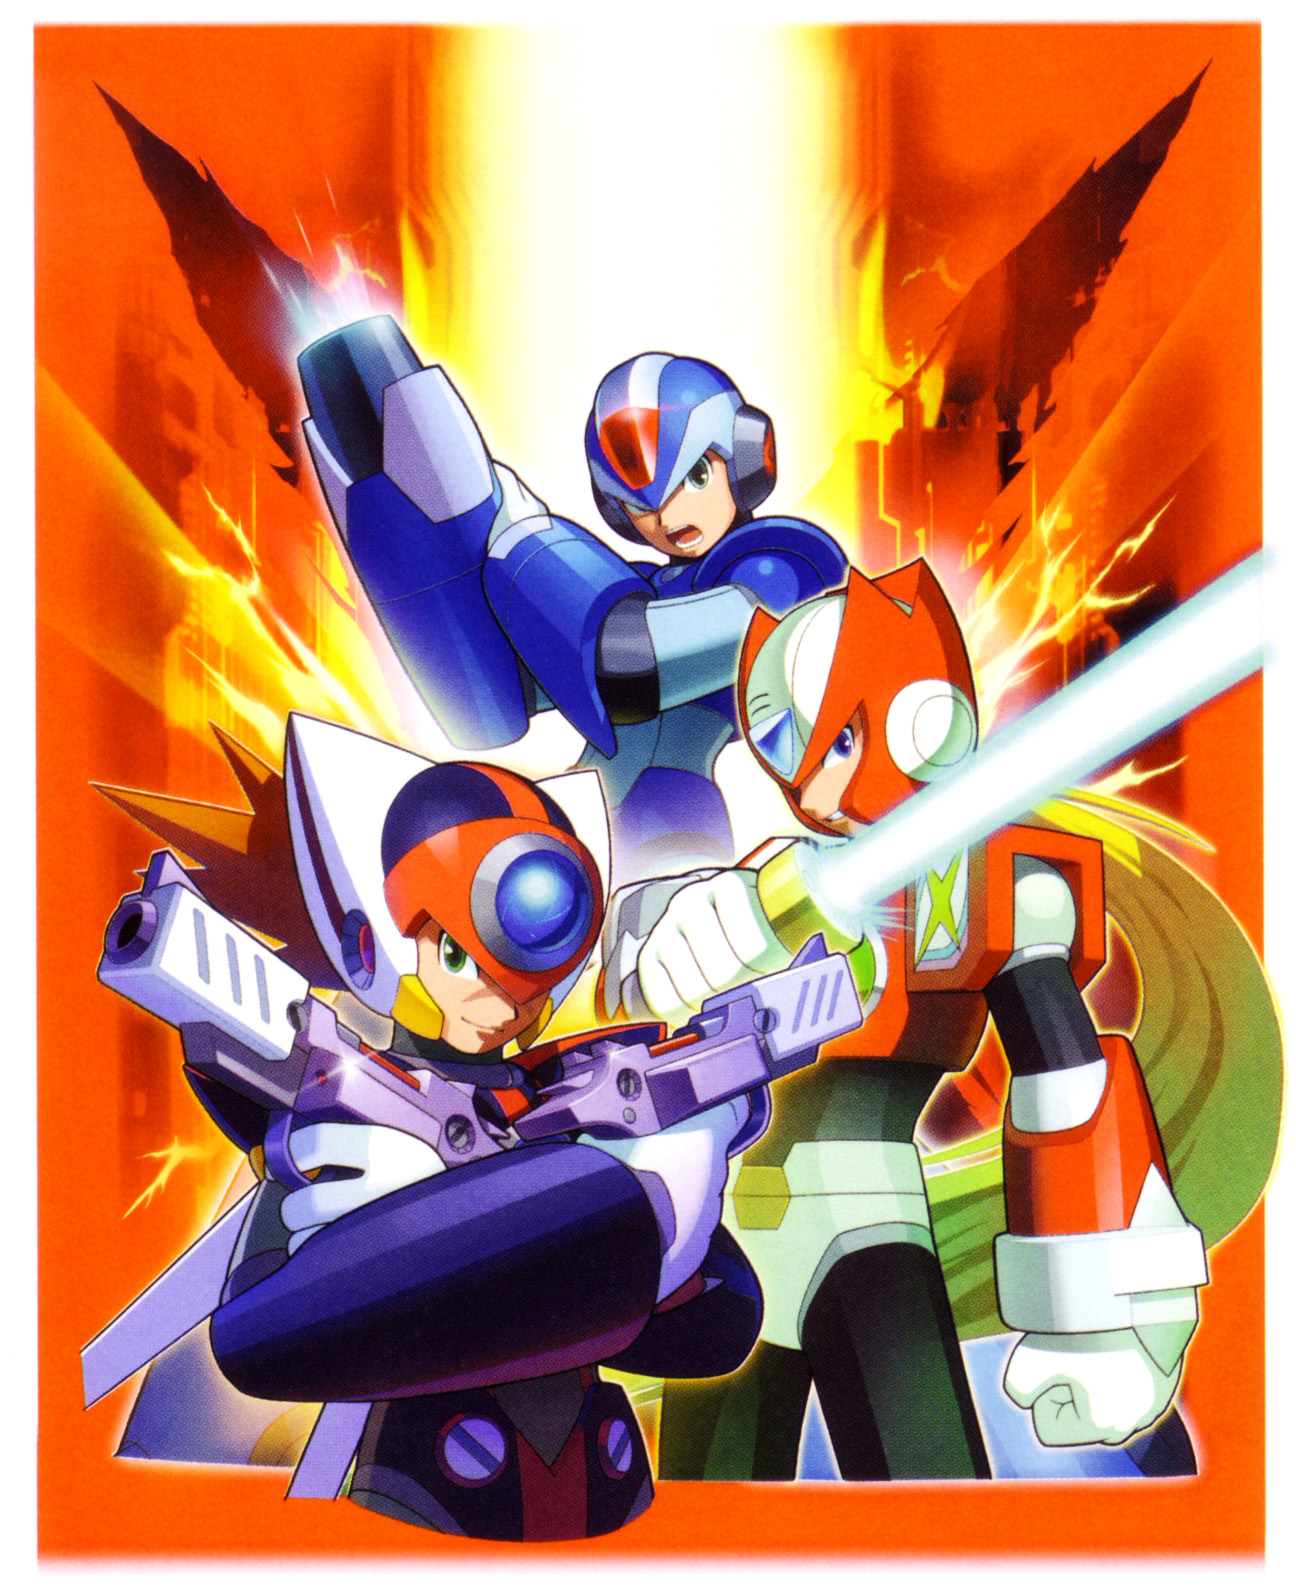 Mega man x series mmkb fandom powered by wikia - Megaman wikia ...